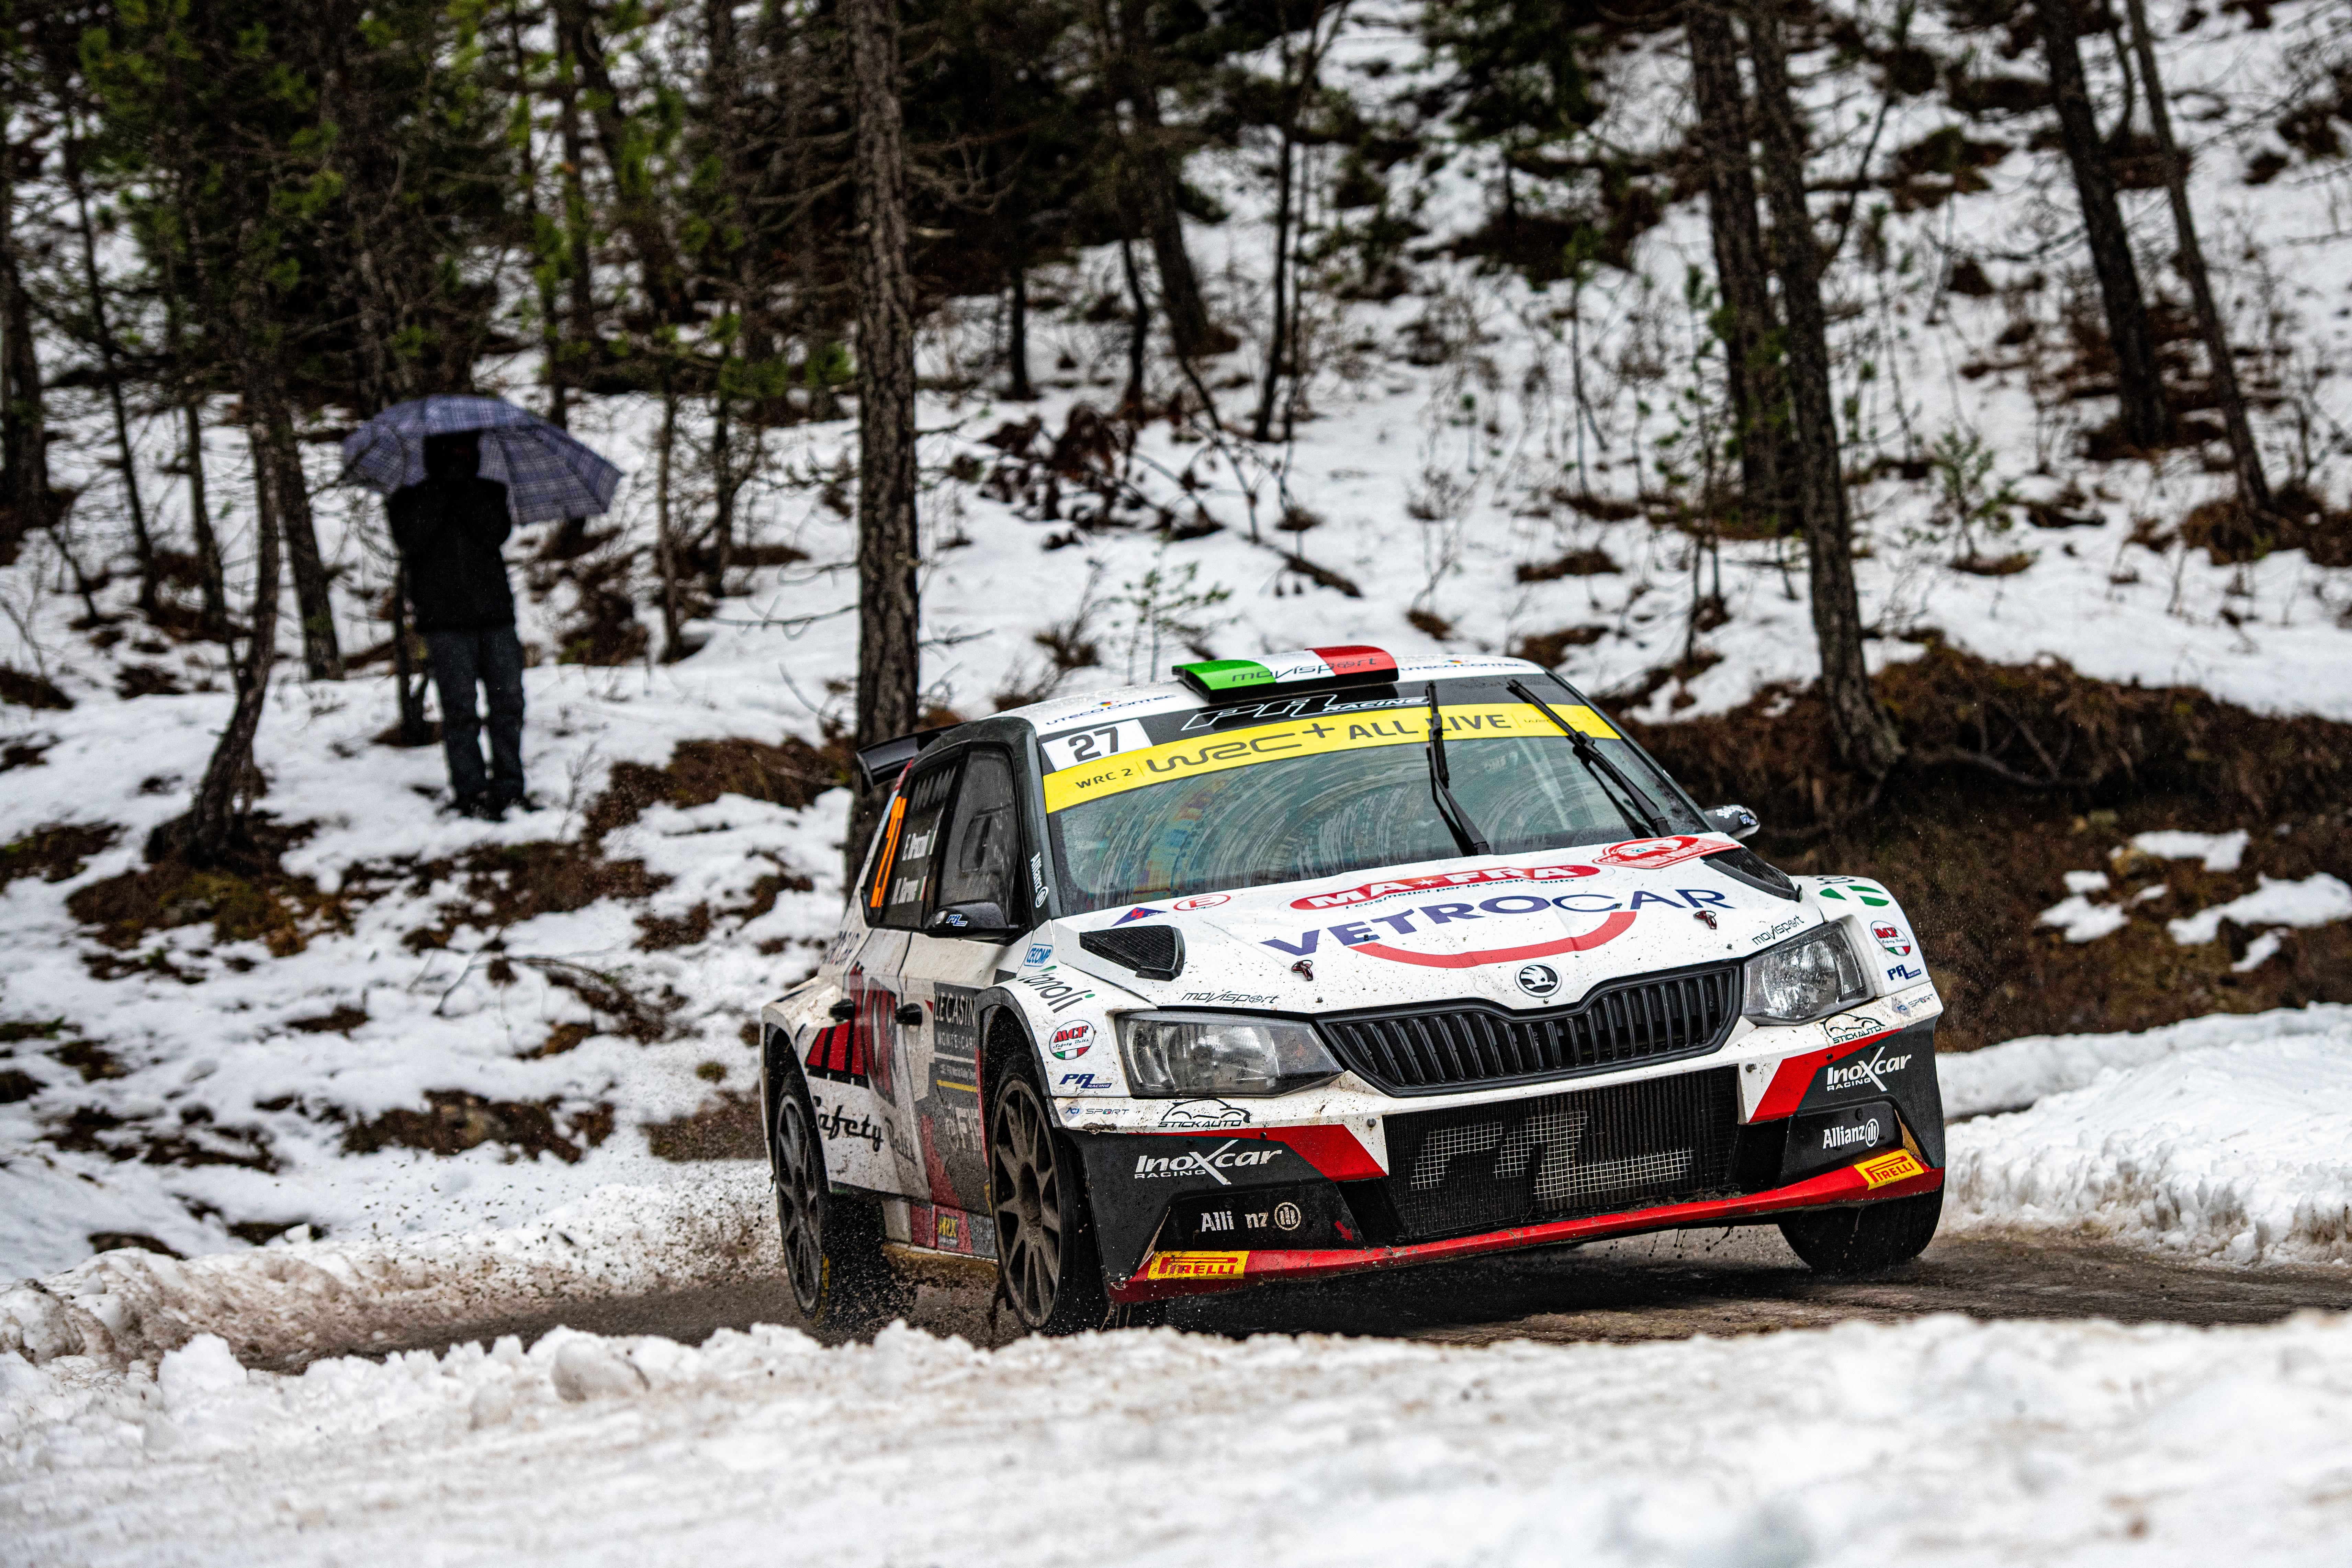 Rallye Monte-Carlo: SKODA FABIA Rally2 evo driver Mikkelsen starts as WRC2 leader into last leg - Image 7